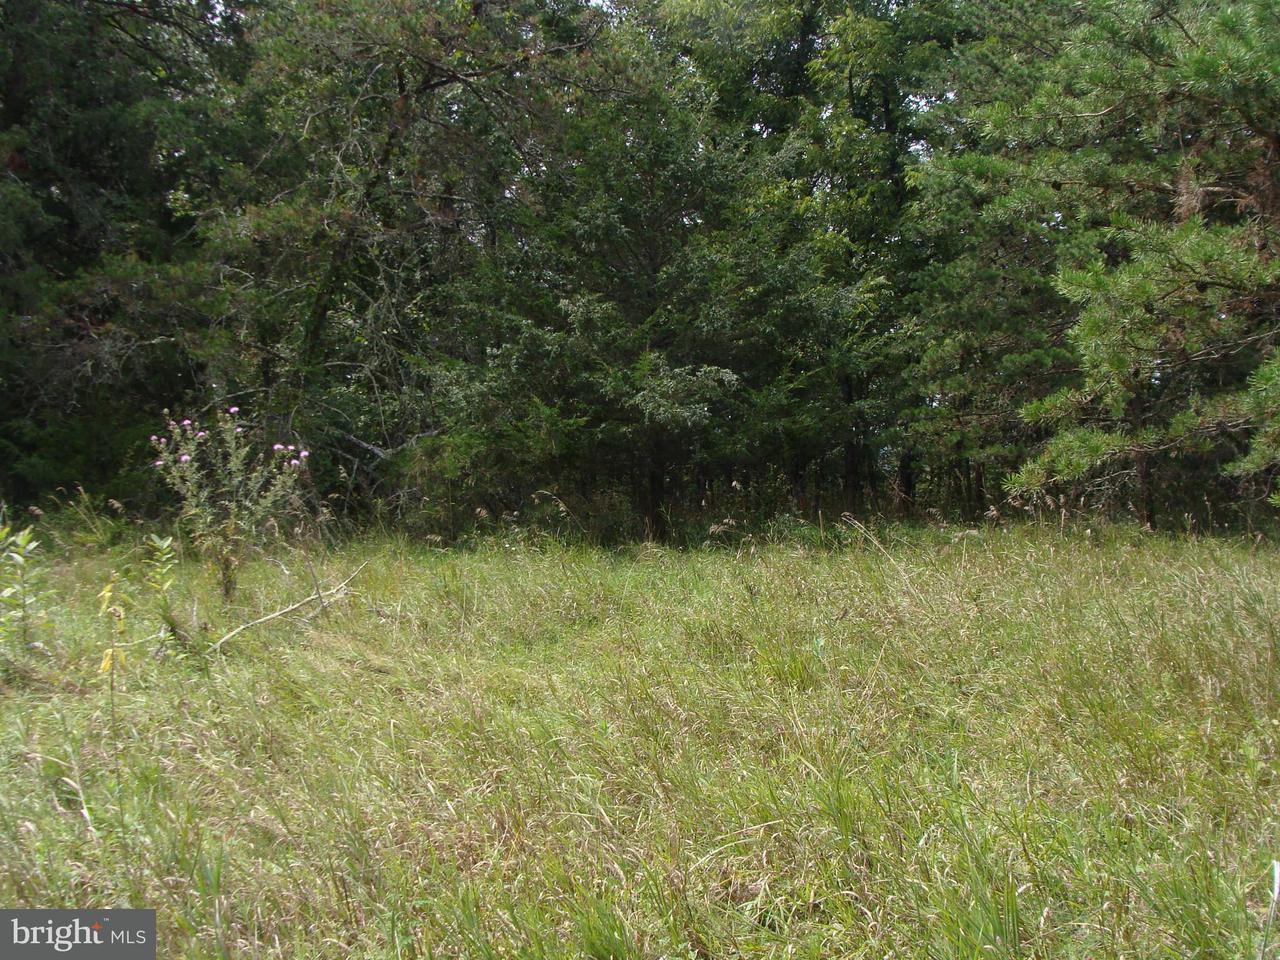 Land for Sale at Lot 8 West Ridge Dr Arthur, West Virginia 26847 United States